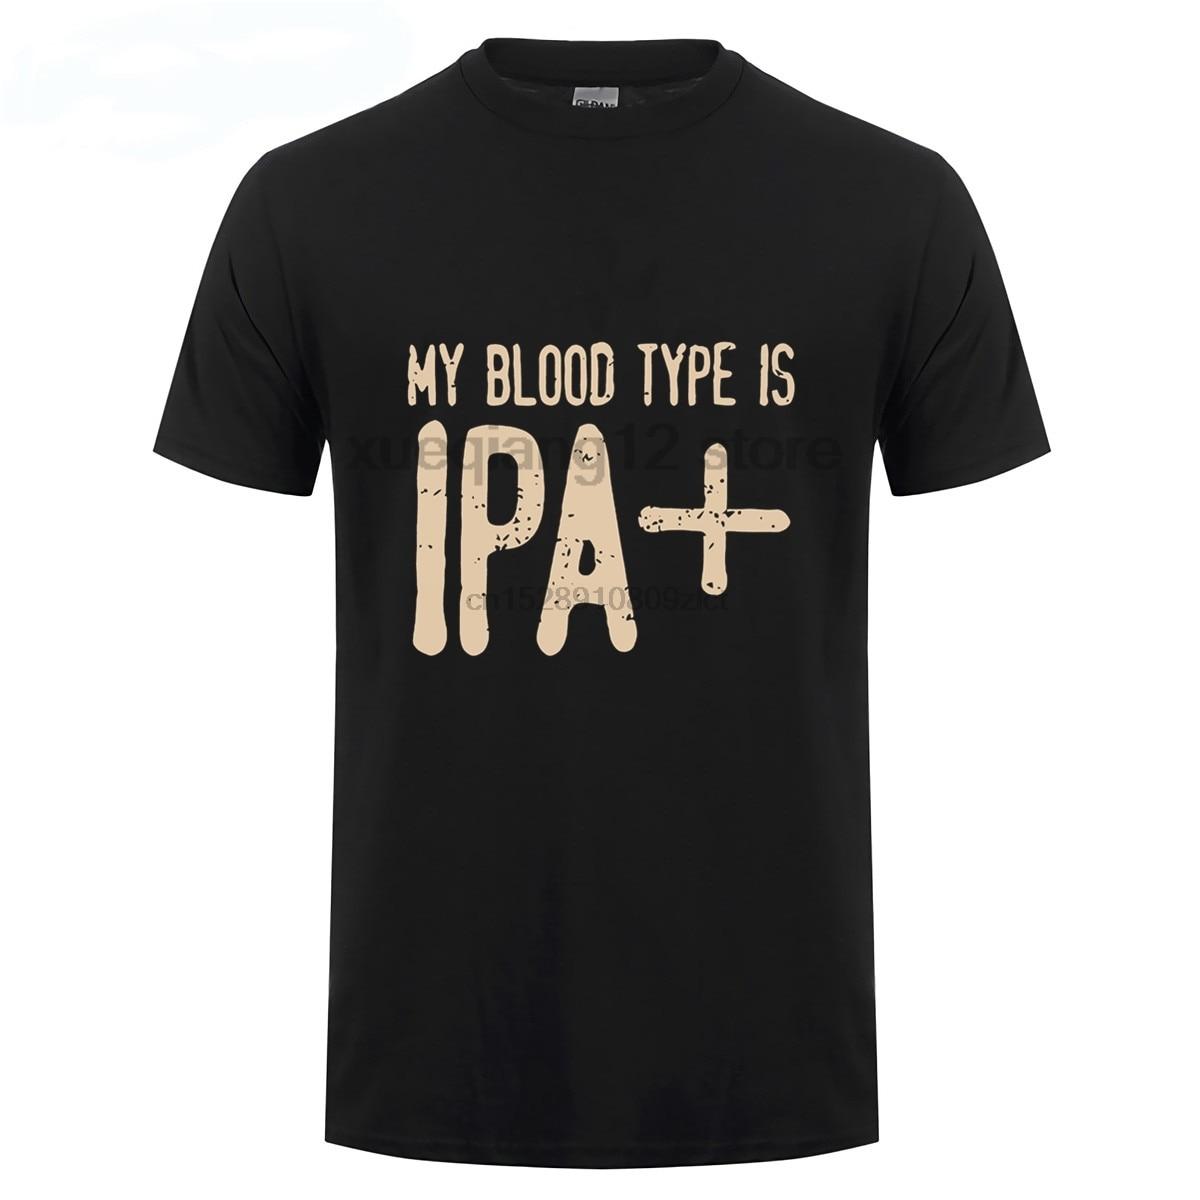 Meu tipo de sangue é ipa men t shirt (1)